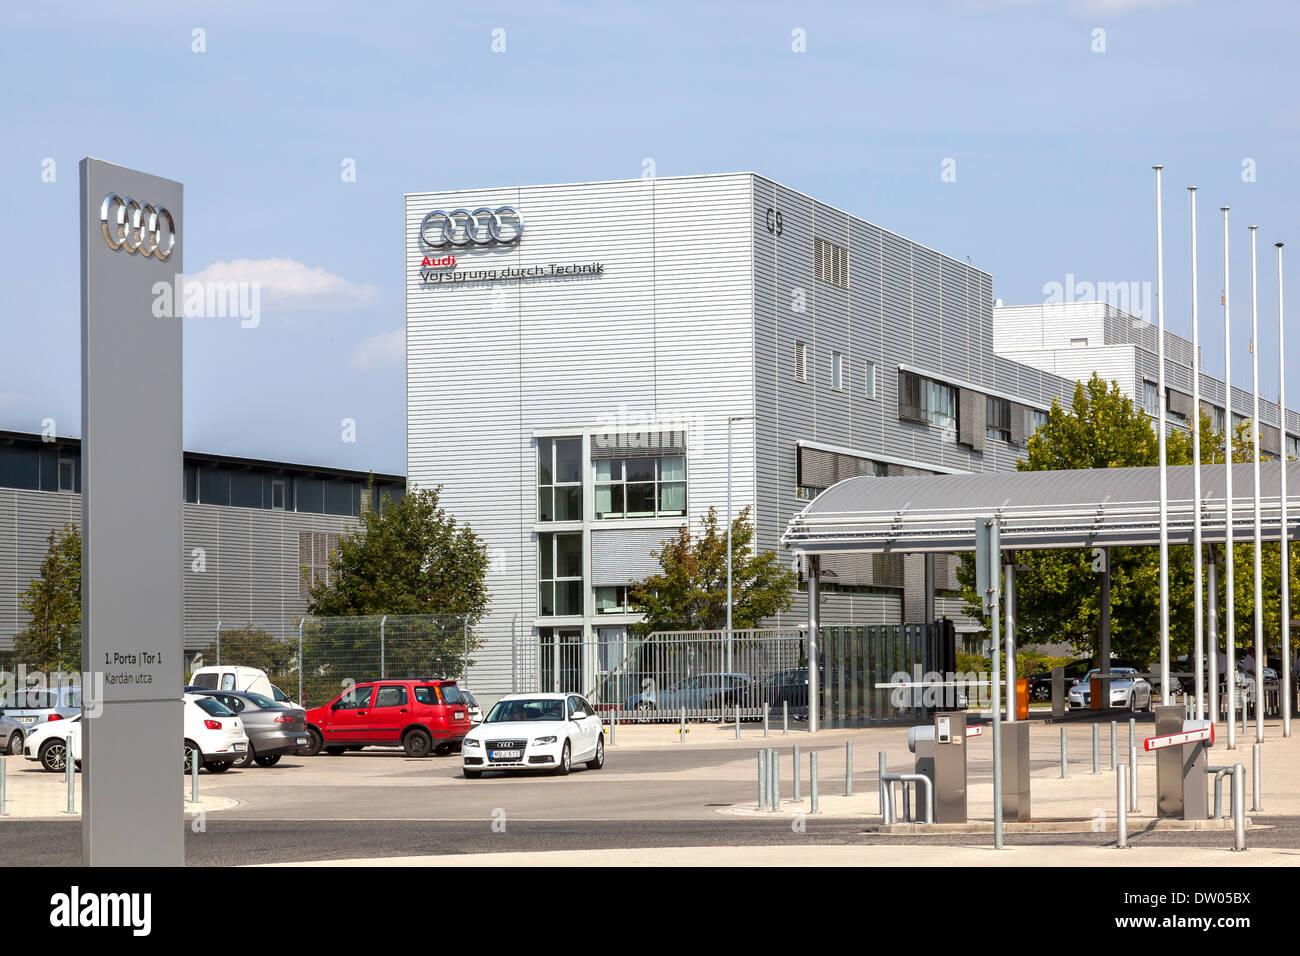 Produktionsstätte der Audi AG in Györ, Ungarn Stockbild